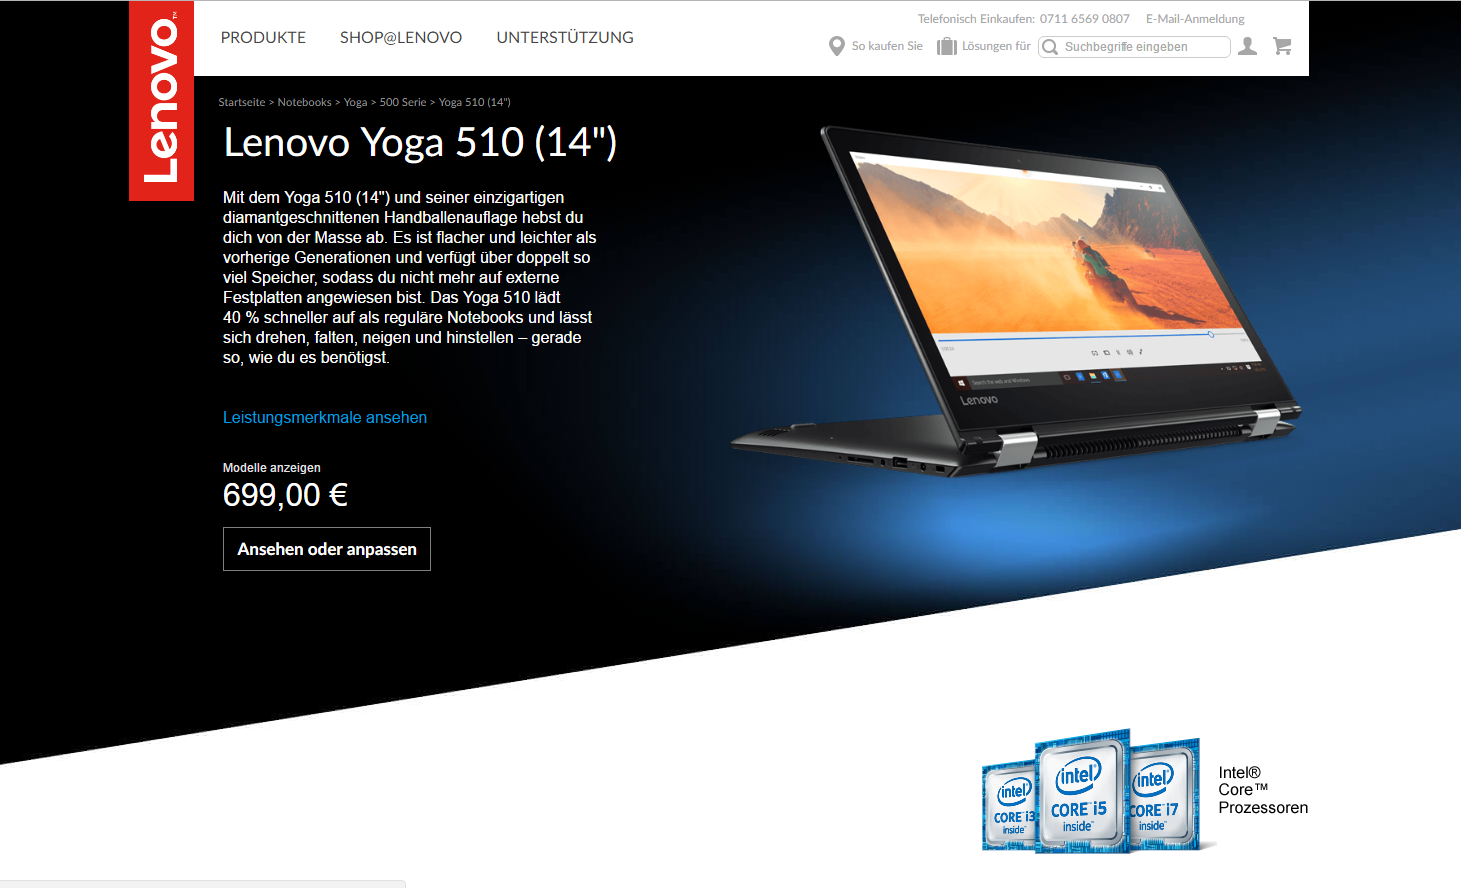 Lenovo Yoga 510: Klein und flexibel